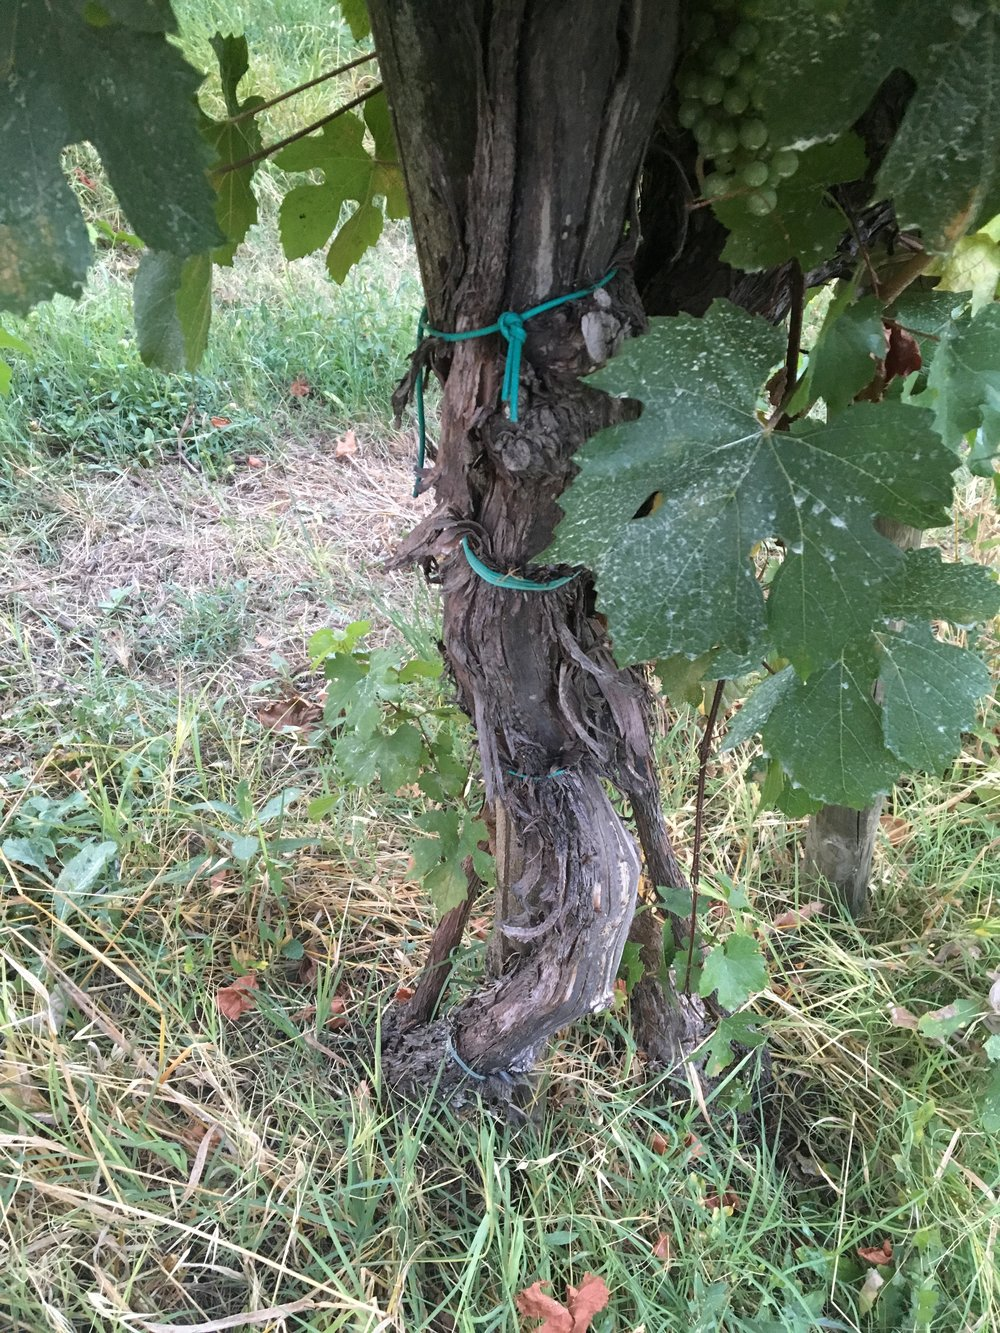 Gradizzolo wijngaard 4.jpg